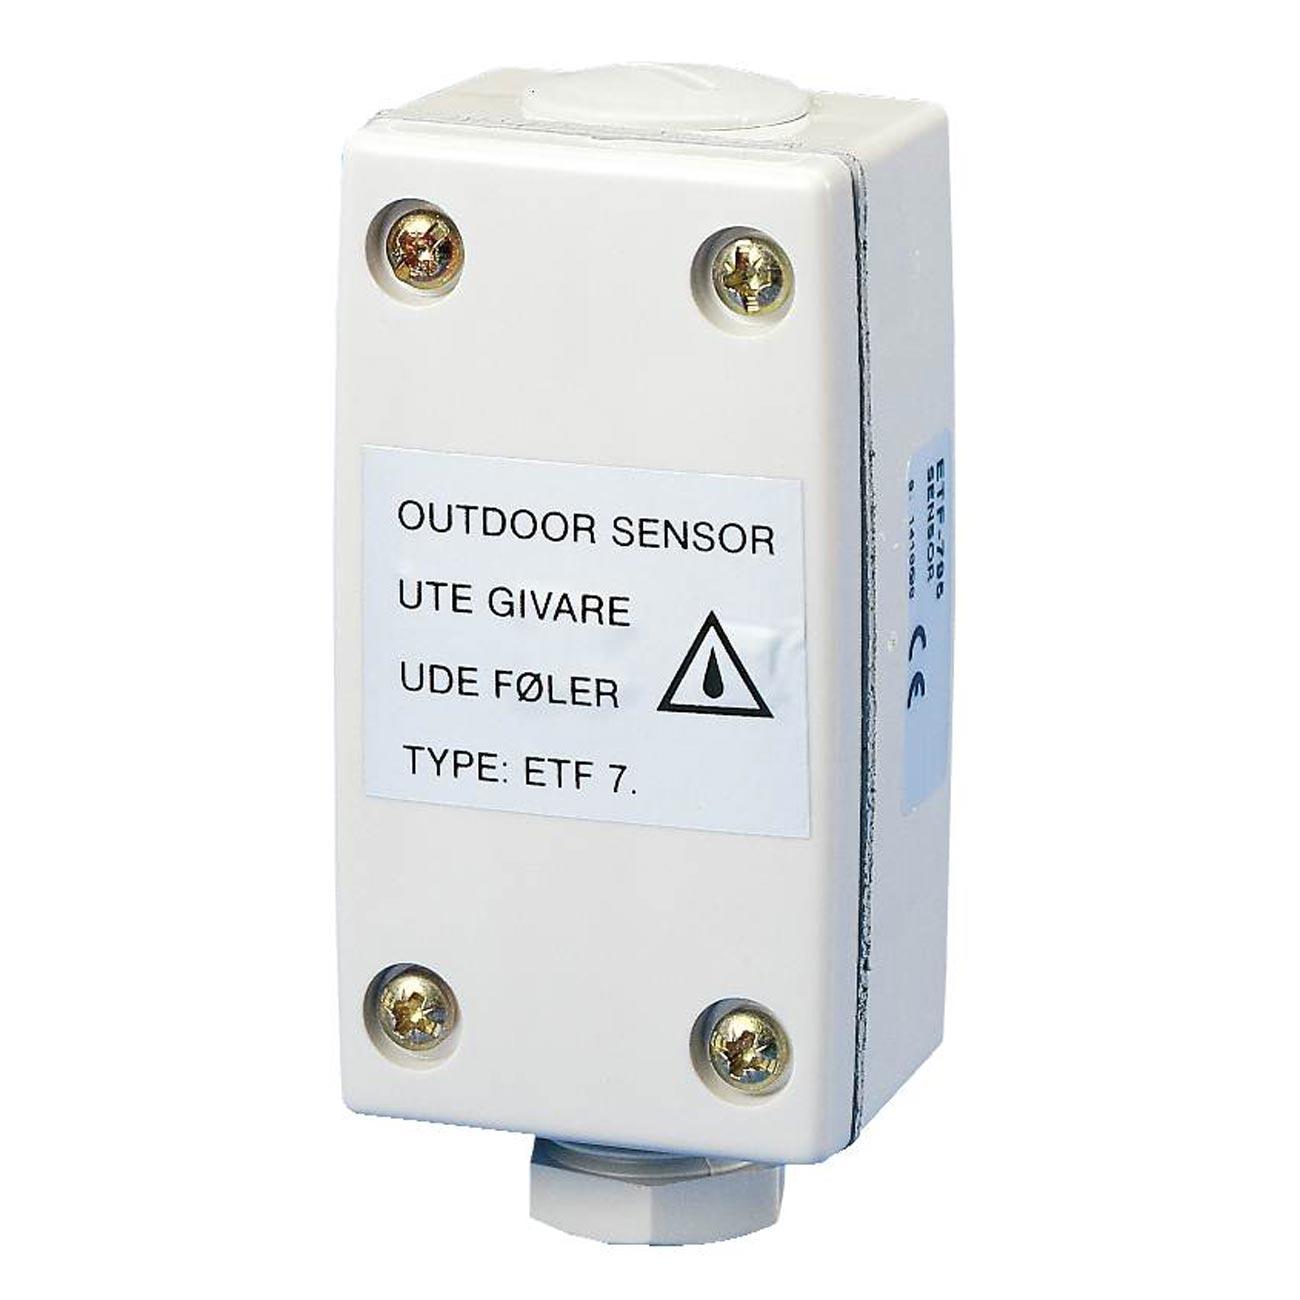 FRO-TEM-SENS External ASir `Temperature Sensor